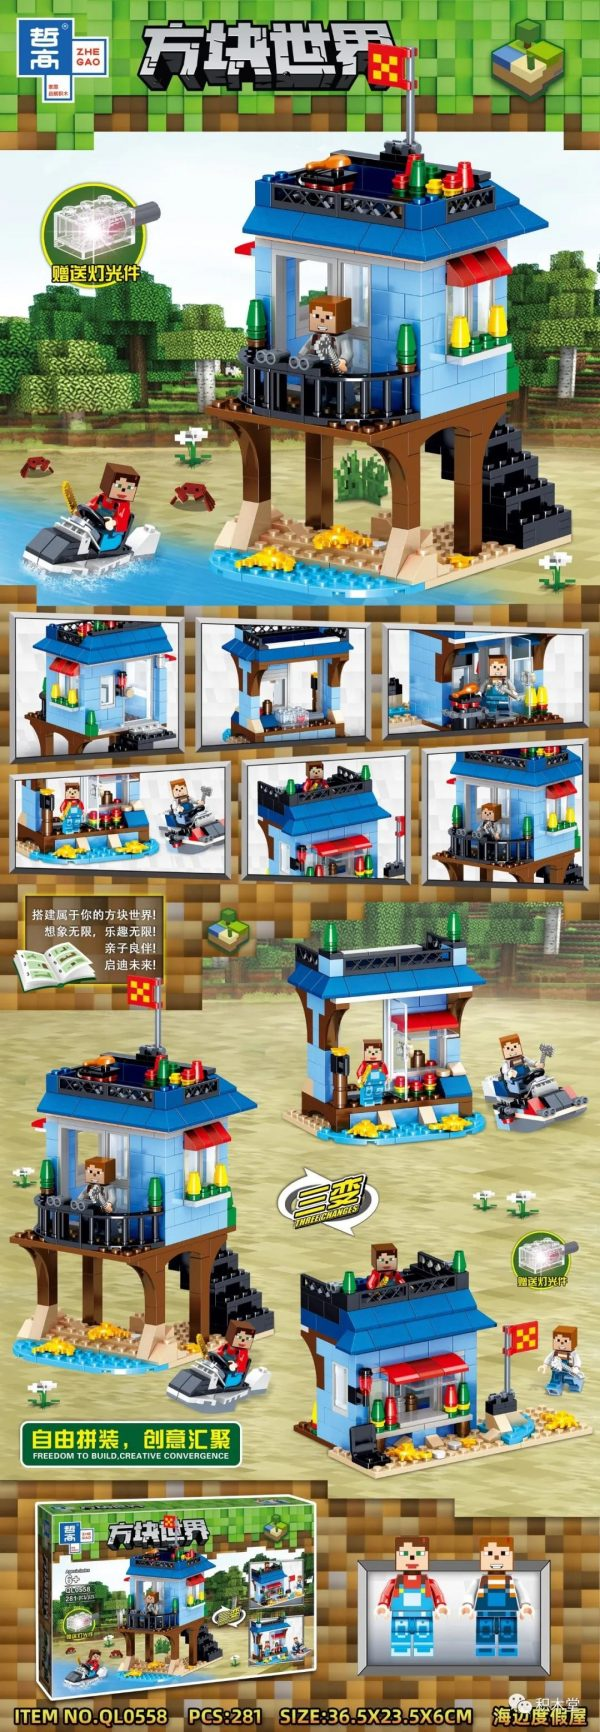 ZHEGAO QL0558 Block World: Beach house. 0